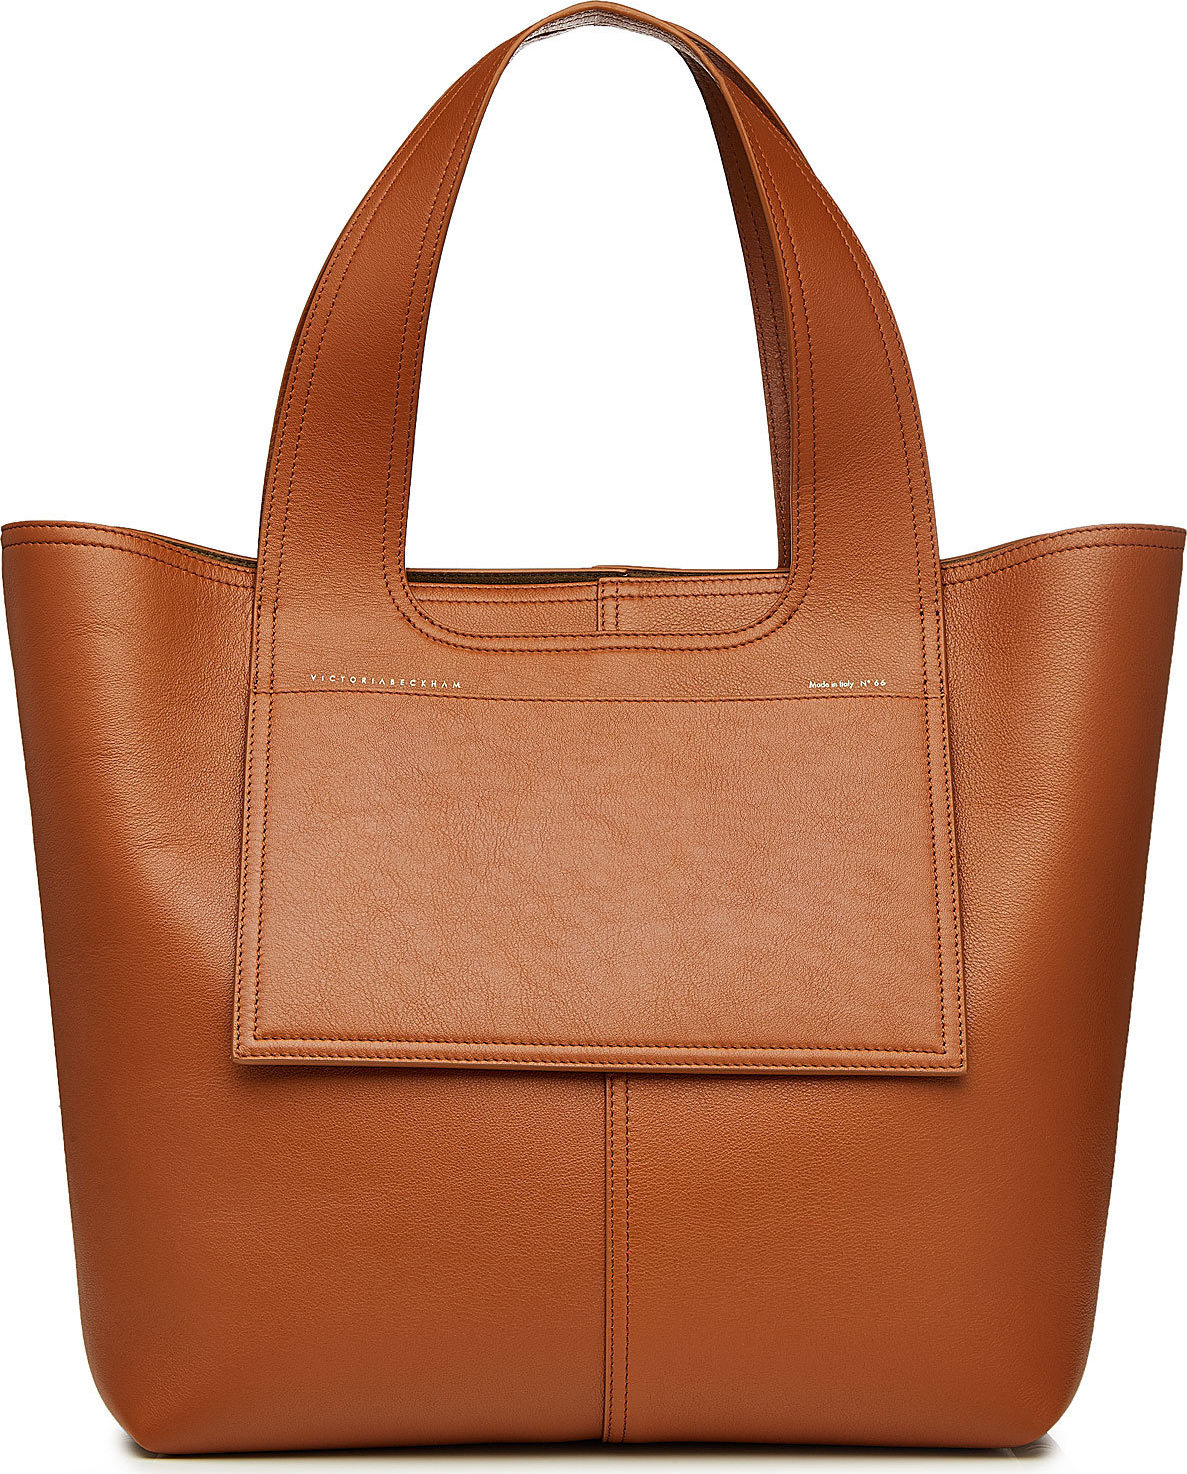 Victoria Beckham - Apron Leather Tote